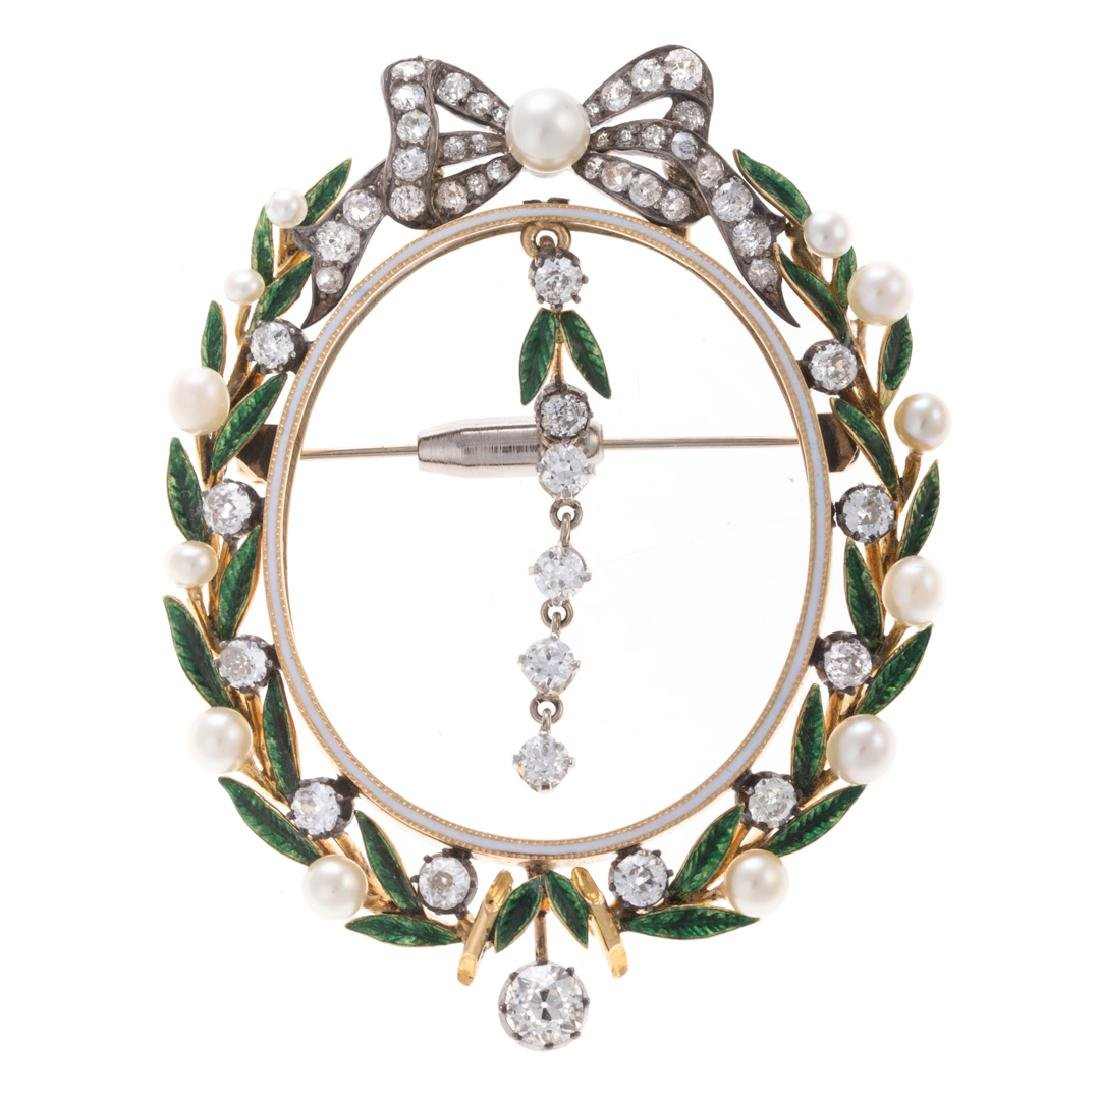 A Pearl, Diamond and Green Enamel Wreath Brooch